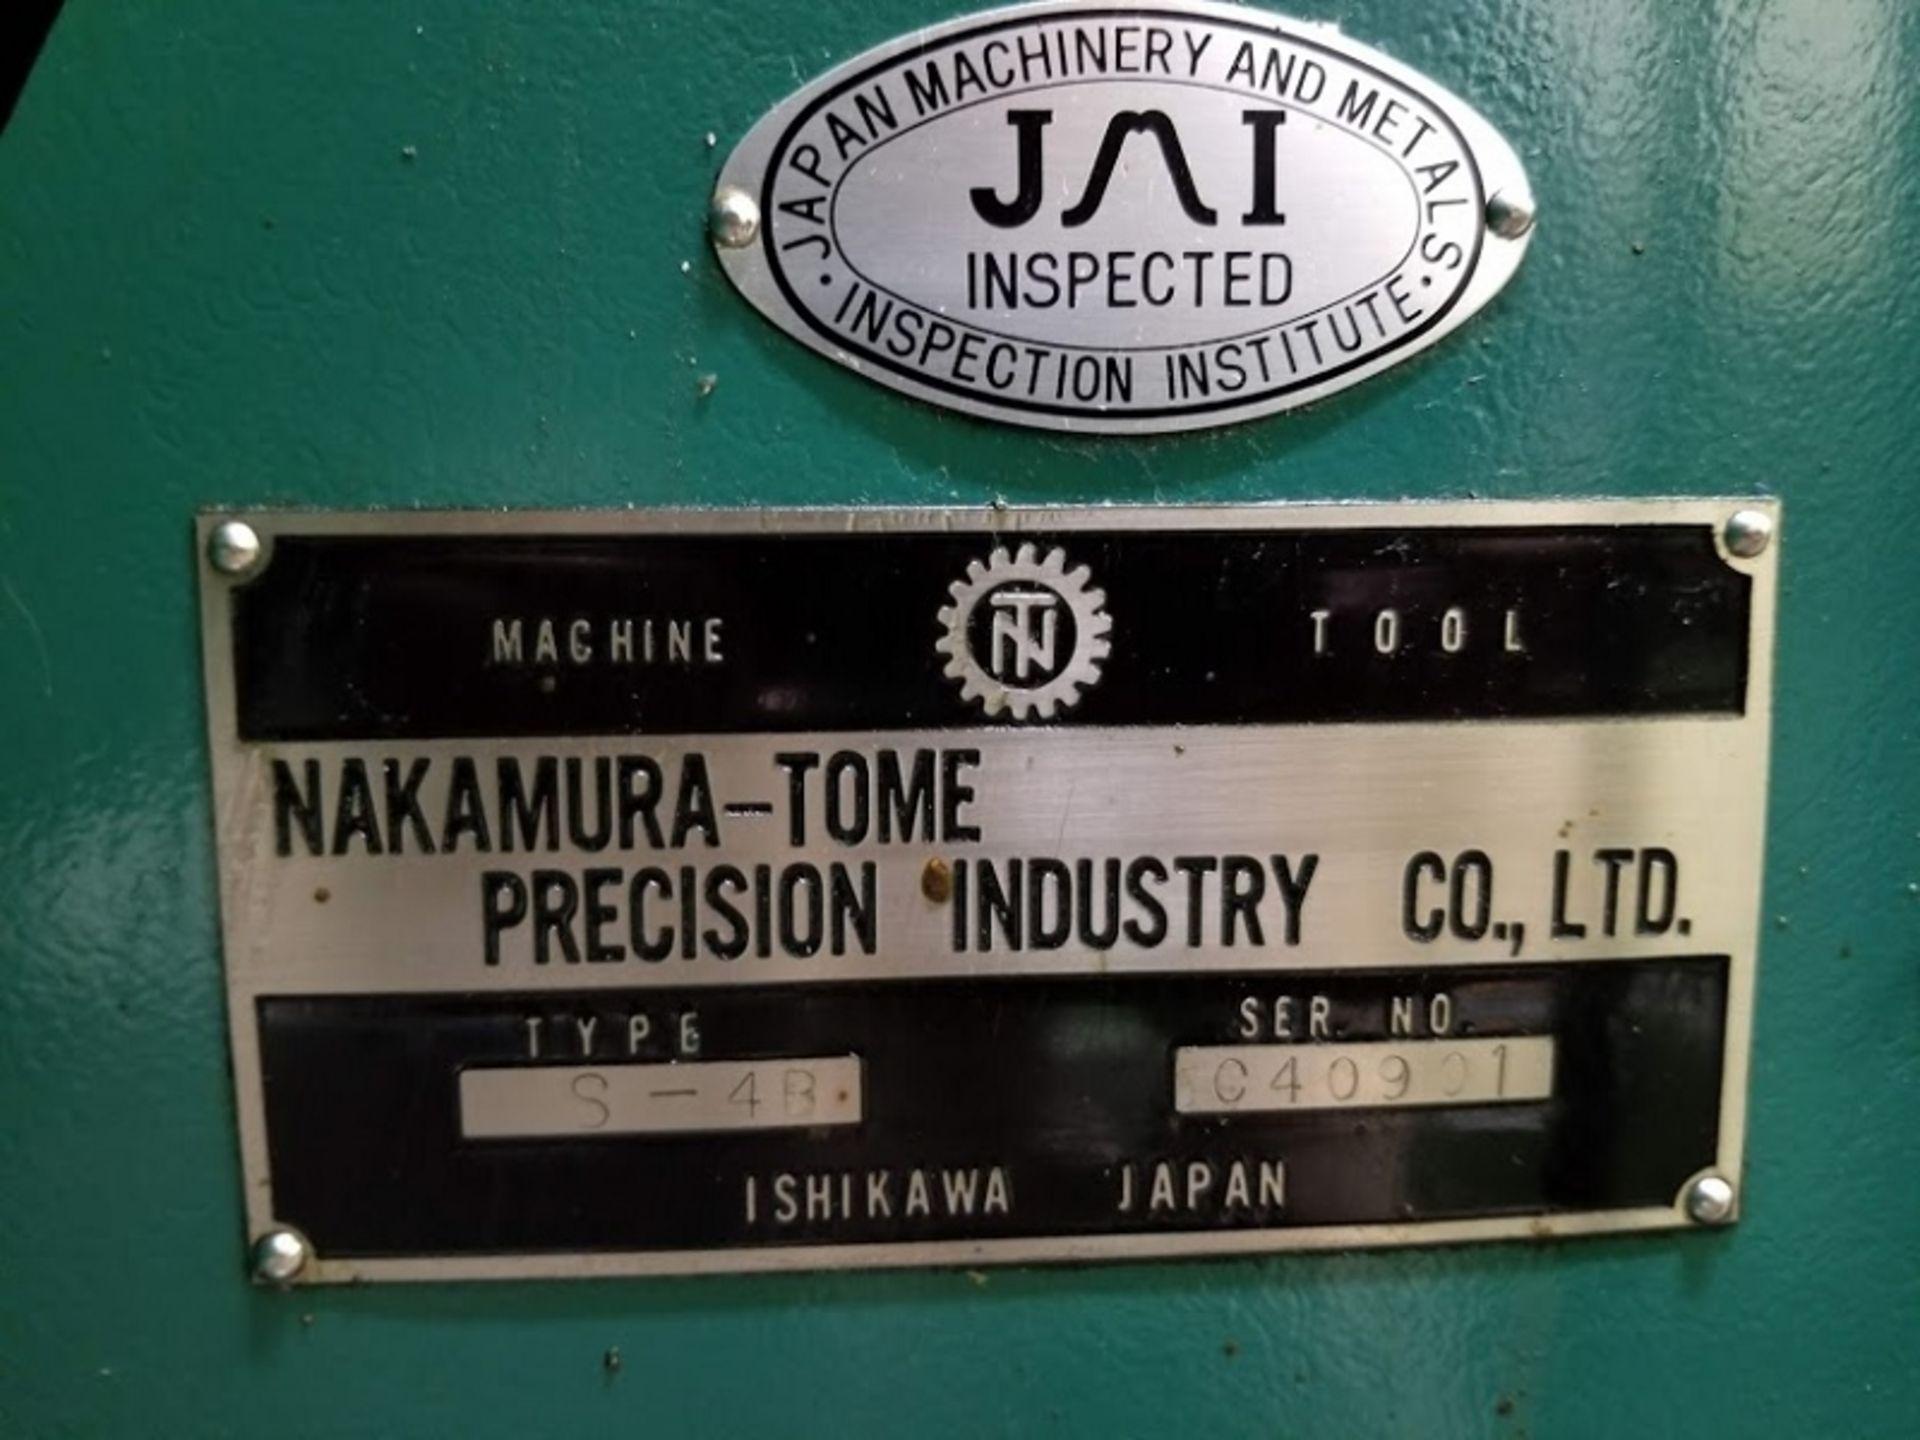 Lot 11 - Nakamura Tome Slant 4 CNC Turning Center with Fanuc 11T Controls SB-4 Serial # C40901